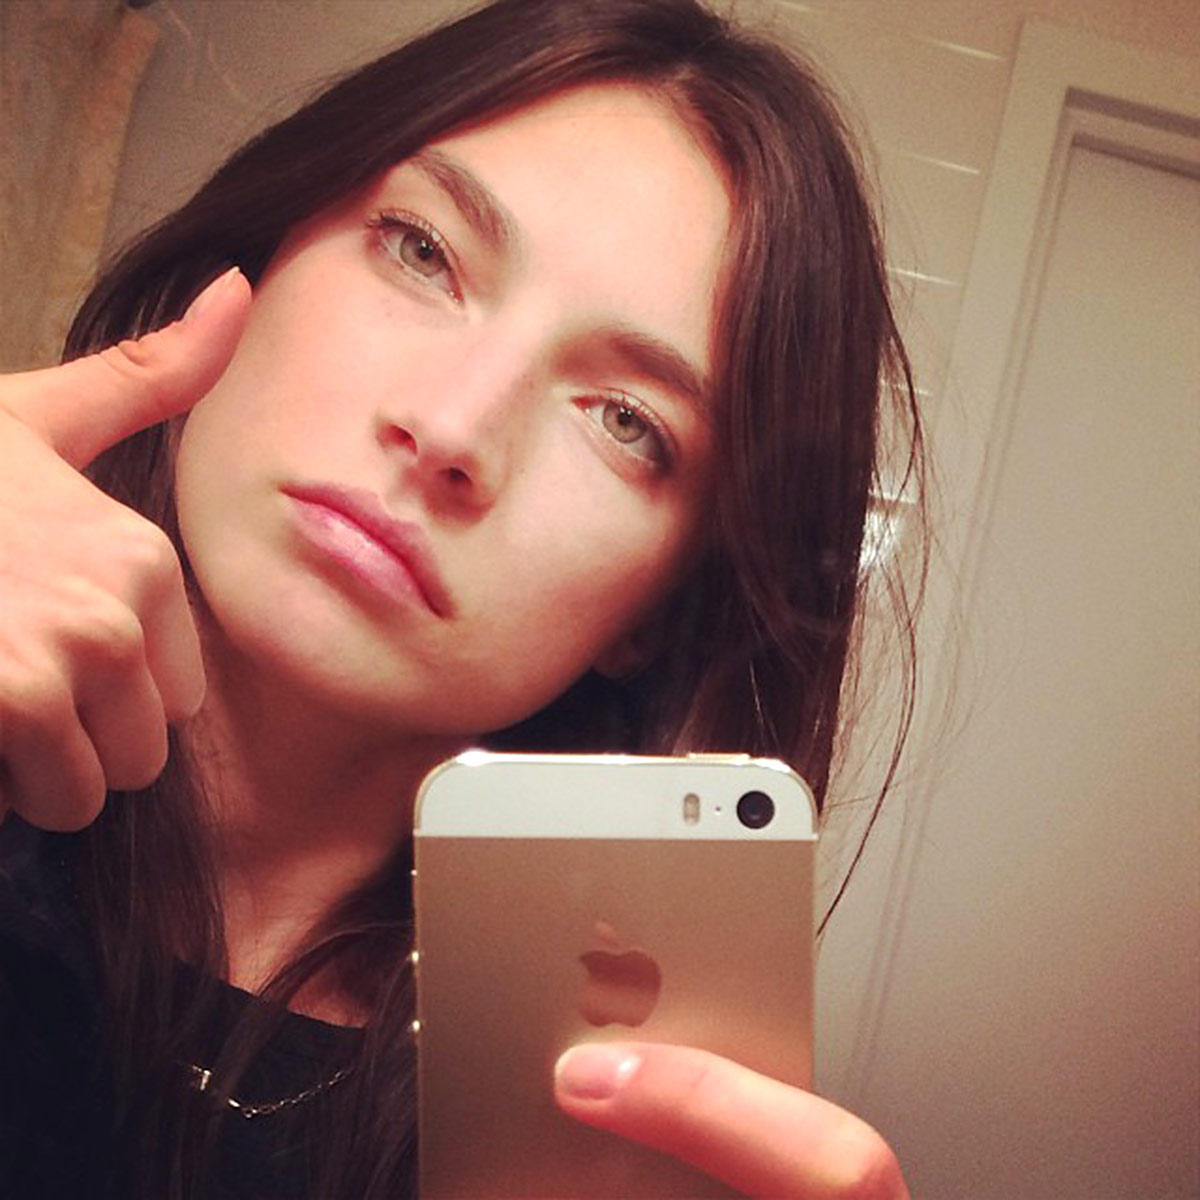 Una chica se toma un selfie